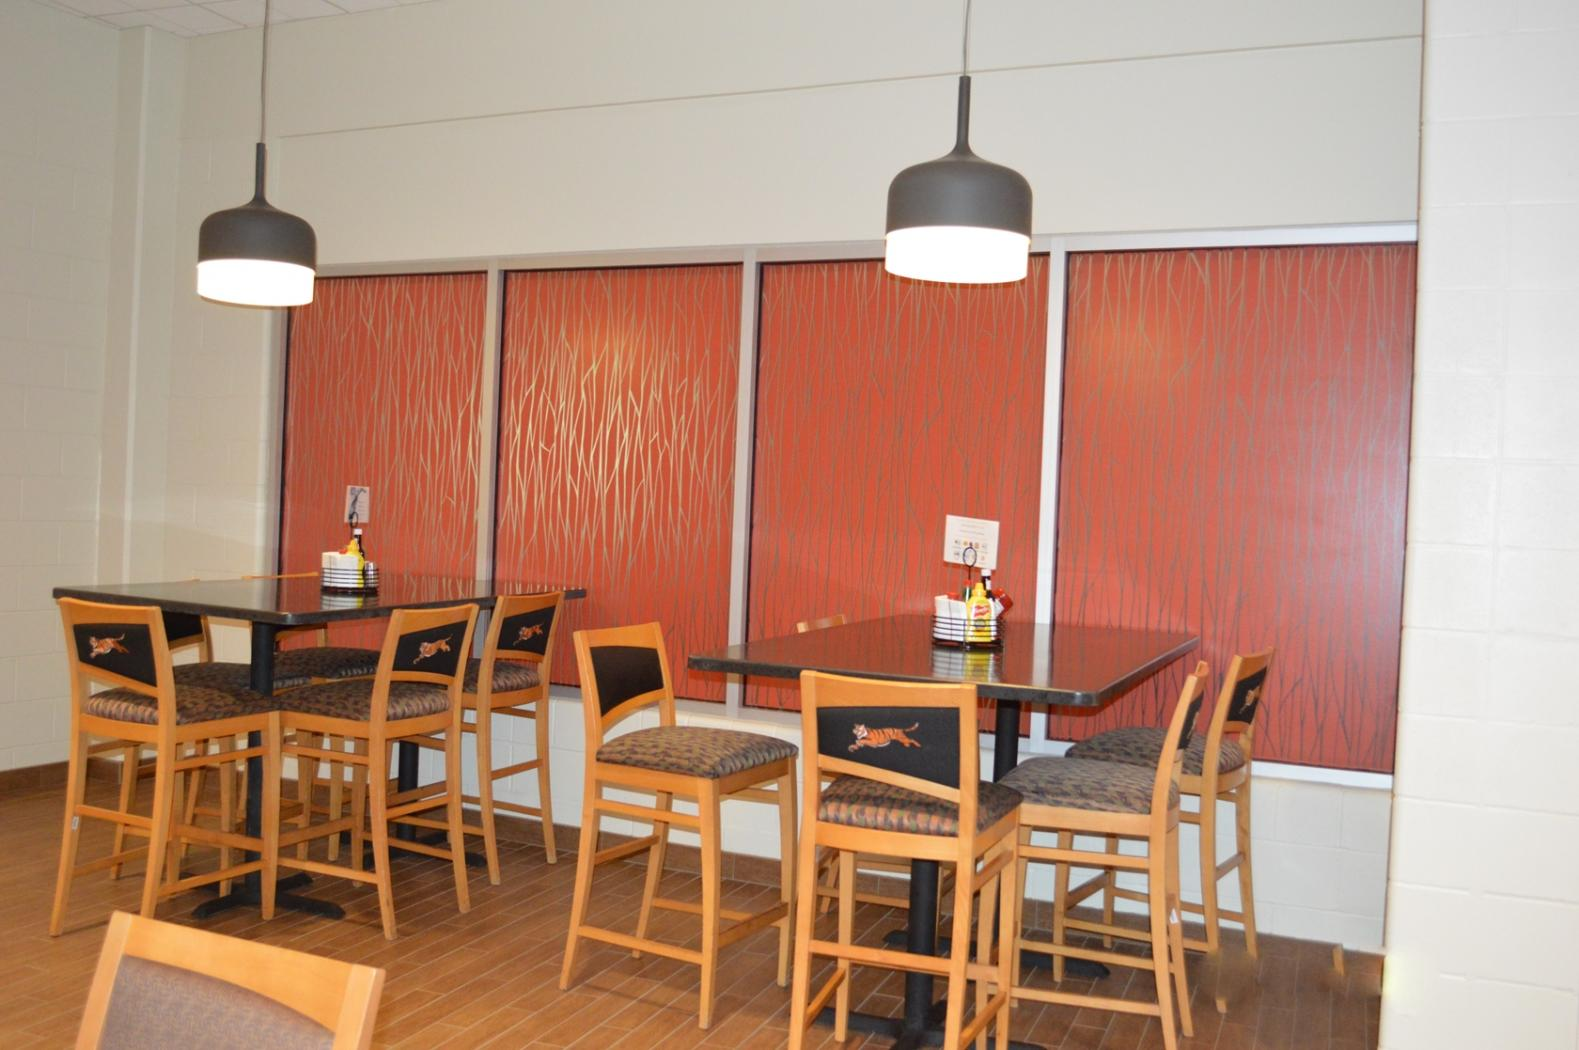 Cincinnati Bengals Weight Room Amp Cafeteria Aag Inc